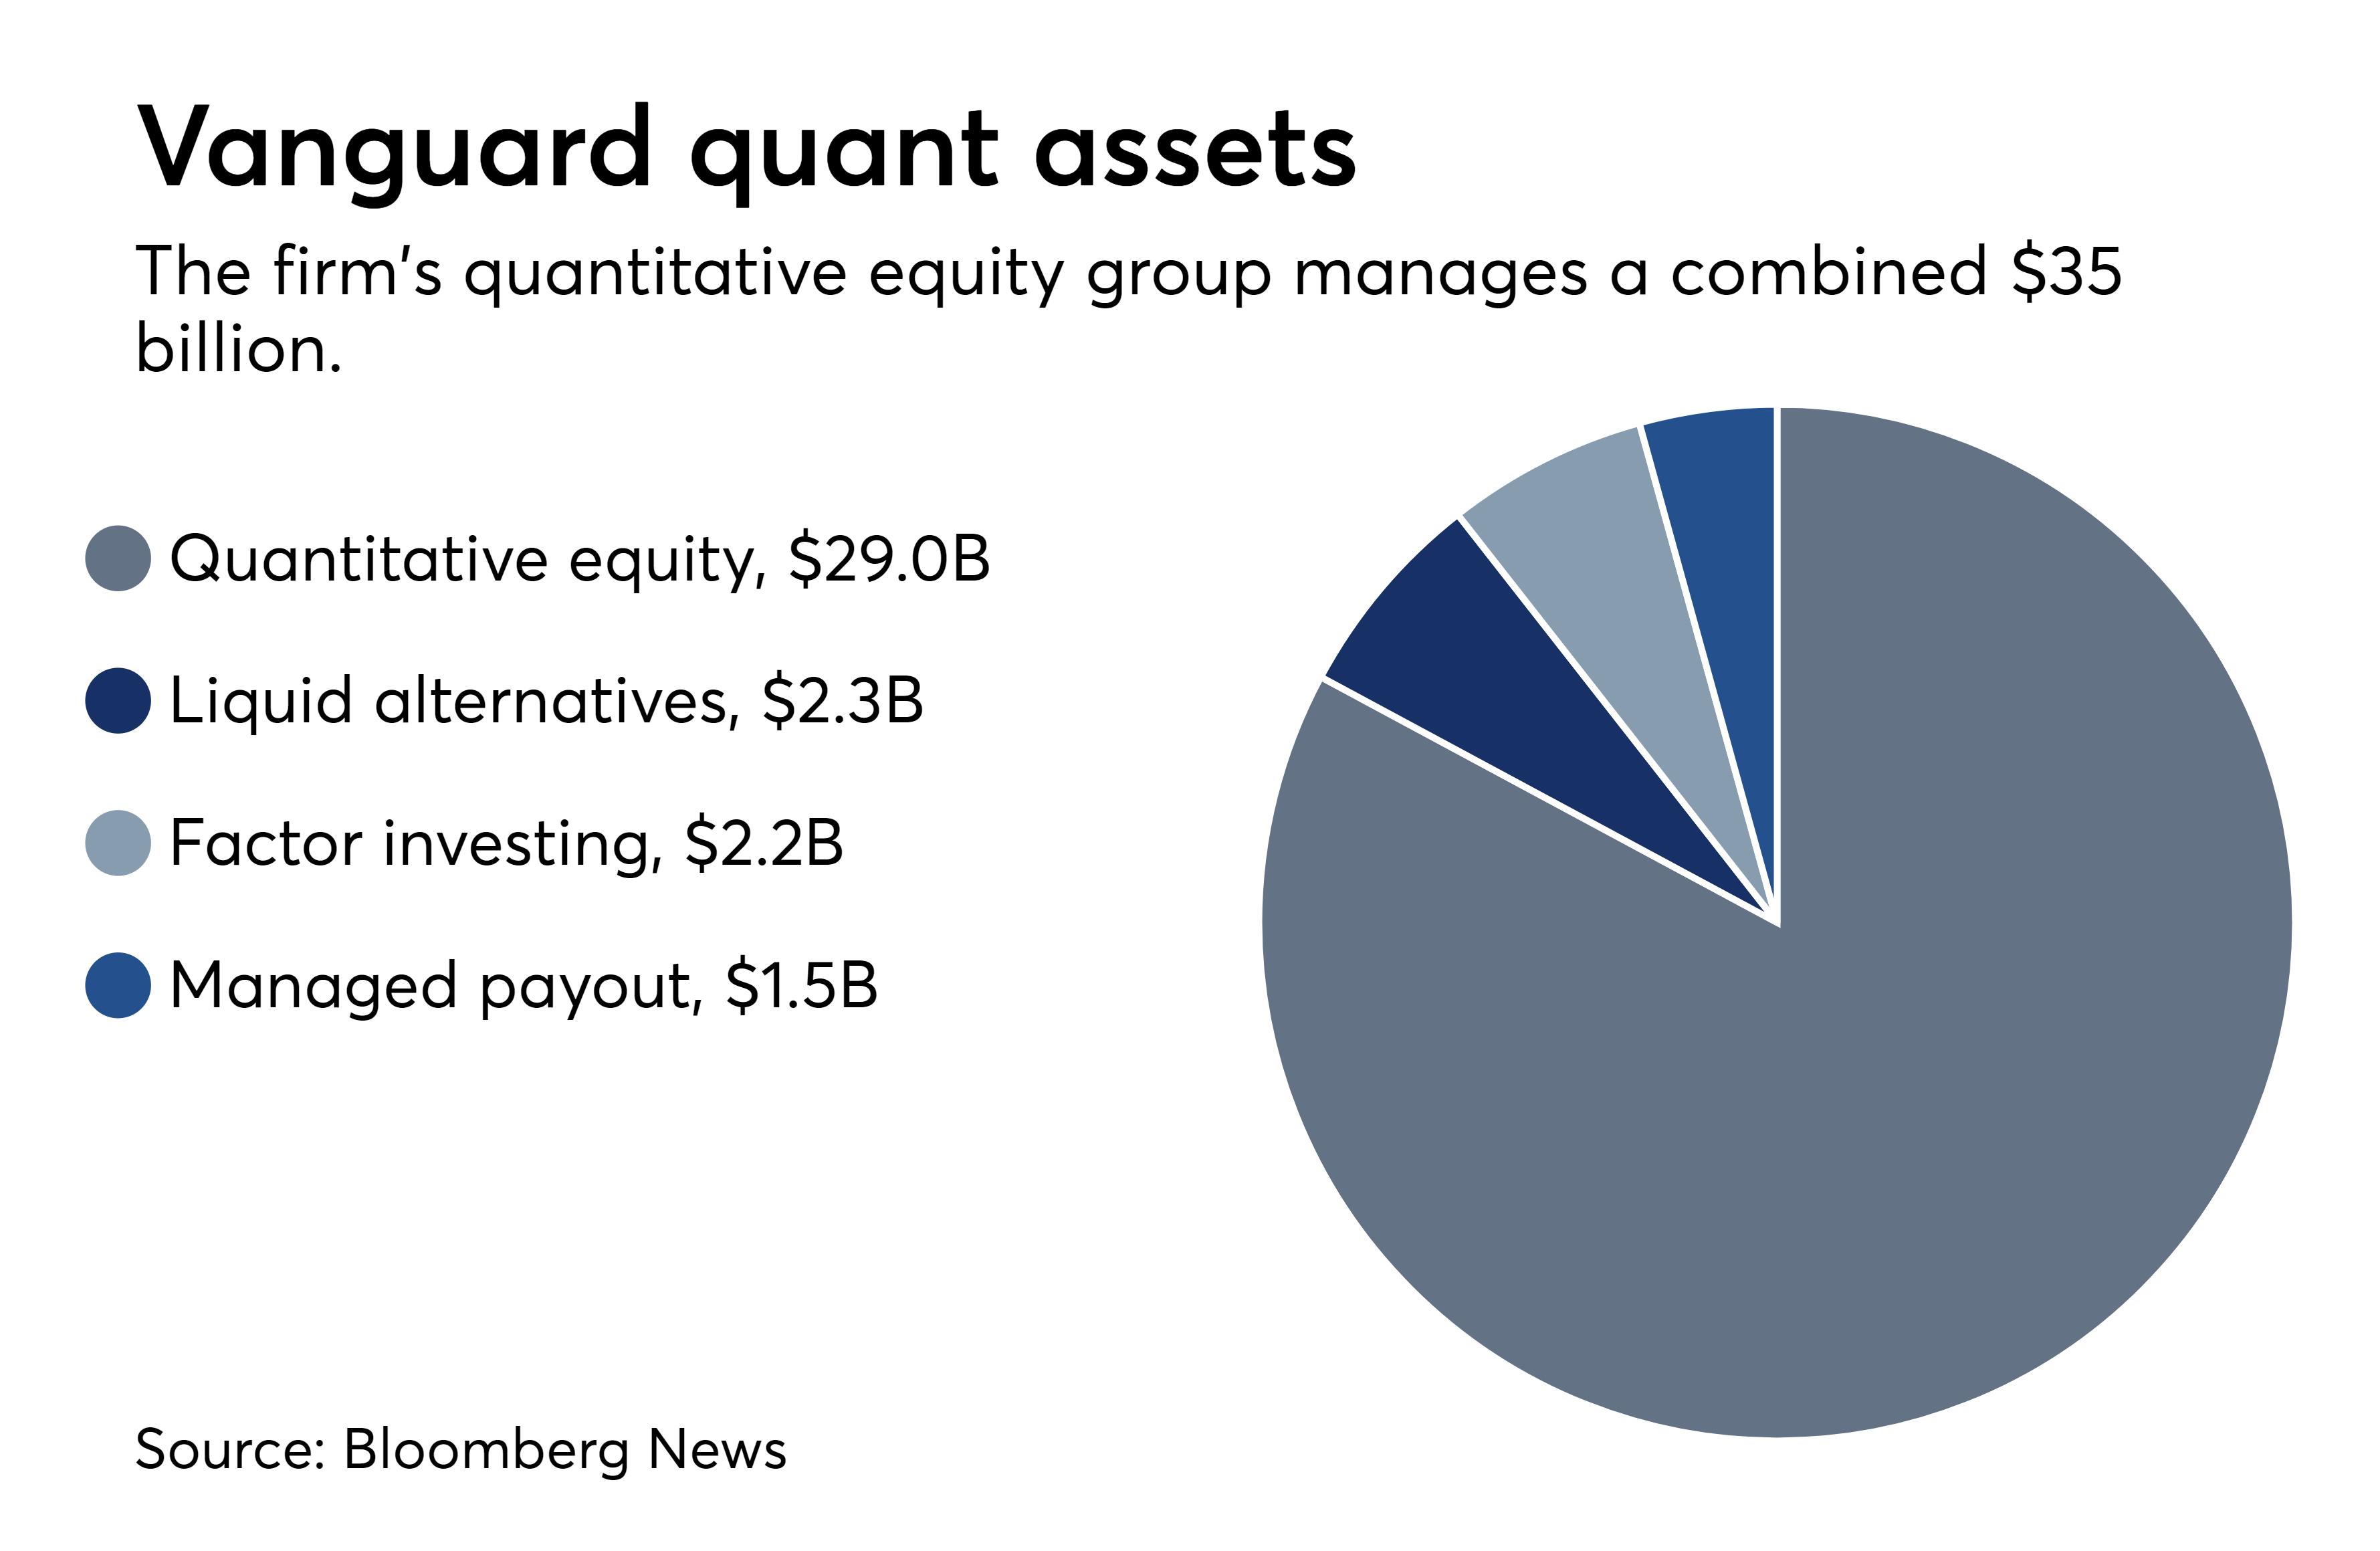 https://assets.sourcemedia.com/79/72/82985b69444faa165357bcbba94b/vanguard-quant-assets-9-29.png